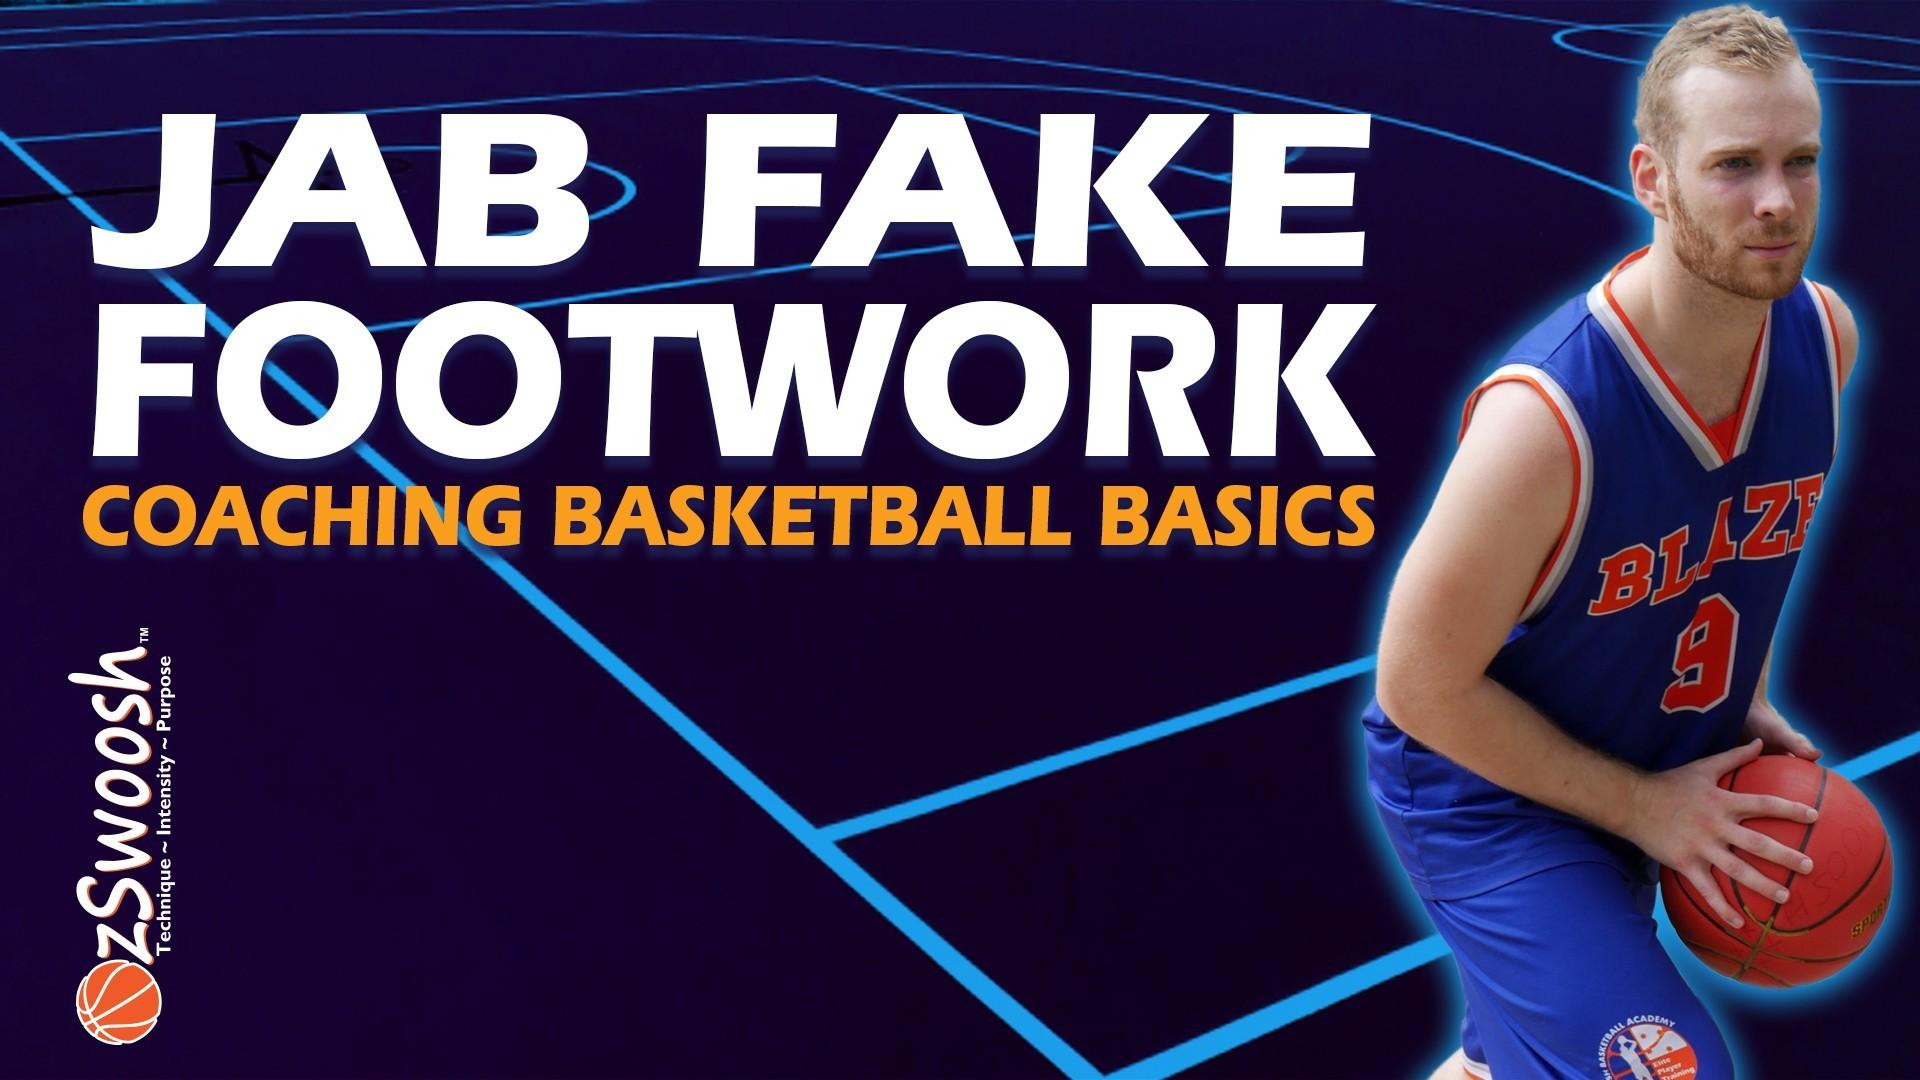 Basic Basketball Drive Jab Fake Footwork - Coaching Basketball Fundamentals